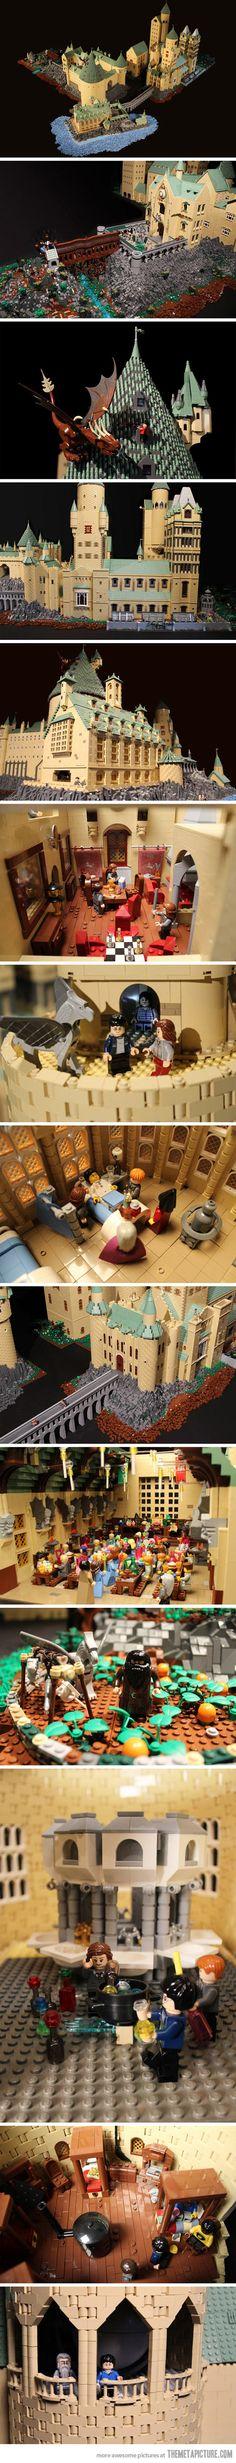 Harry Potter Lego Castle!